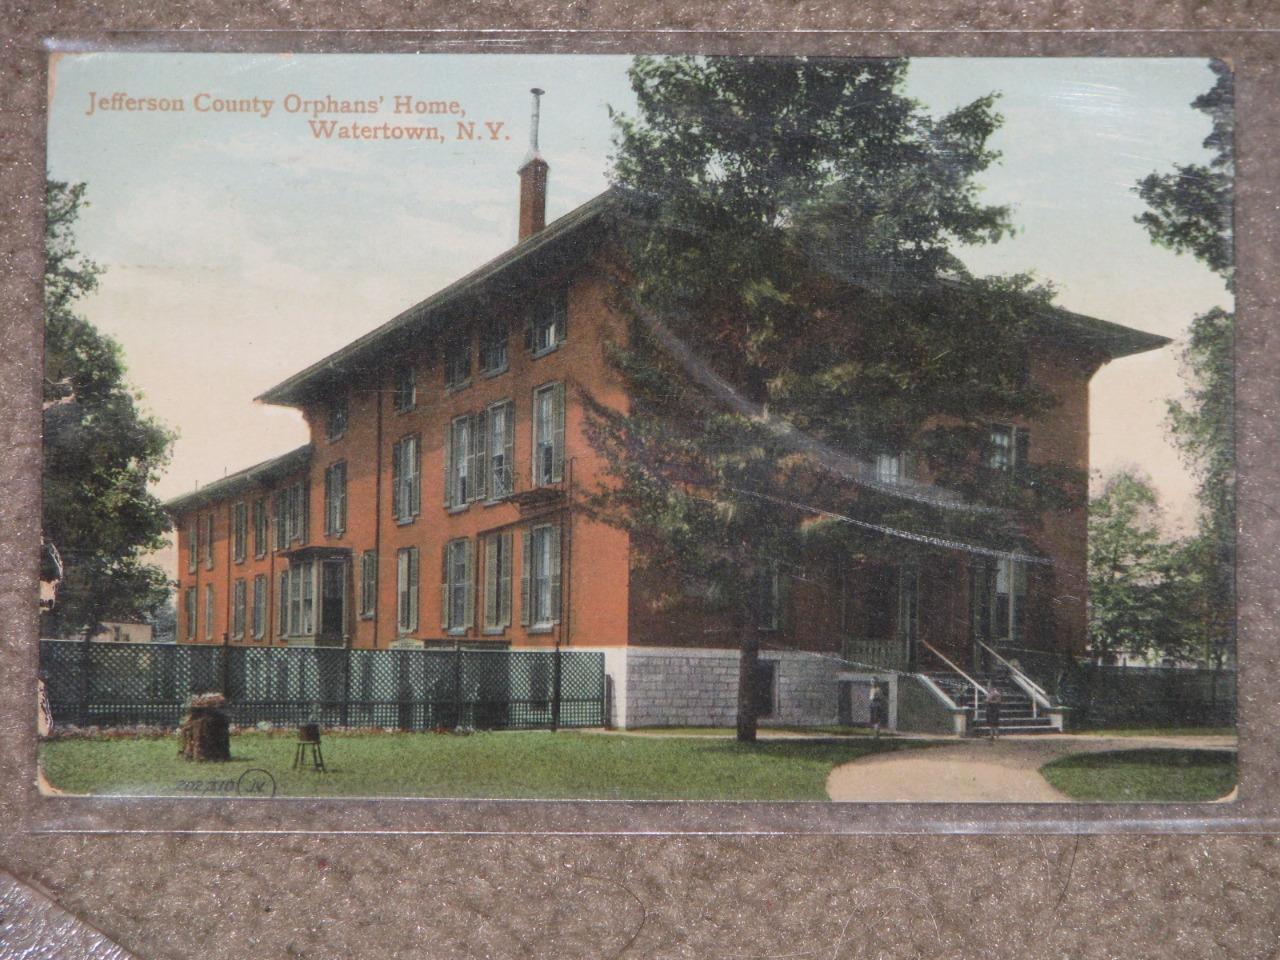 Jefferson County Orphans Home, Watertown, N.Y. 1910, used vintage card